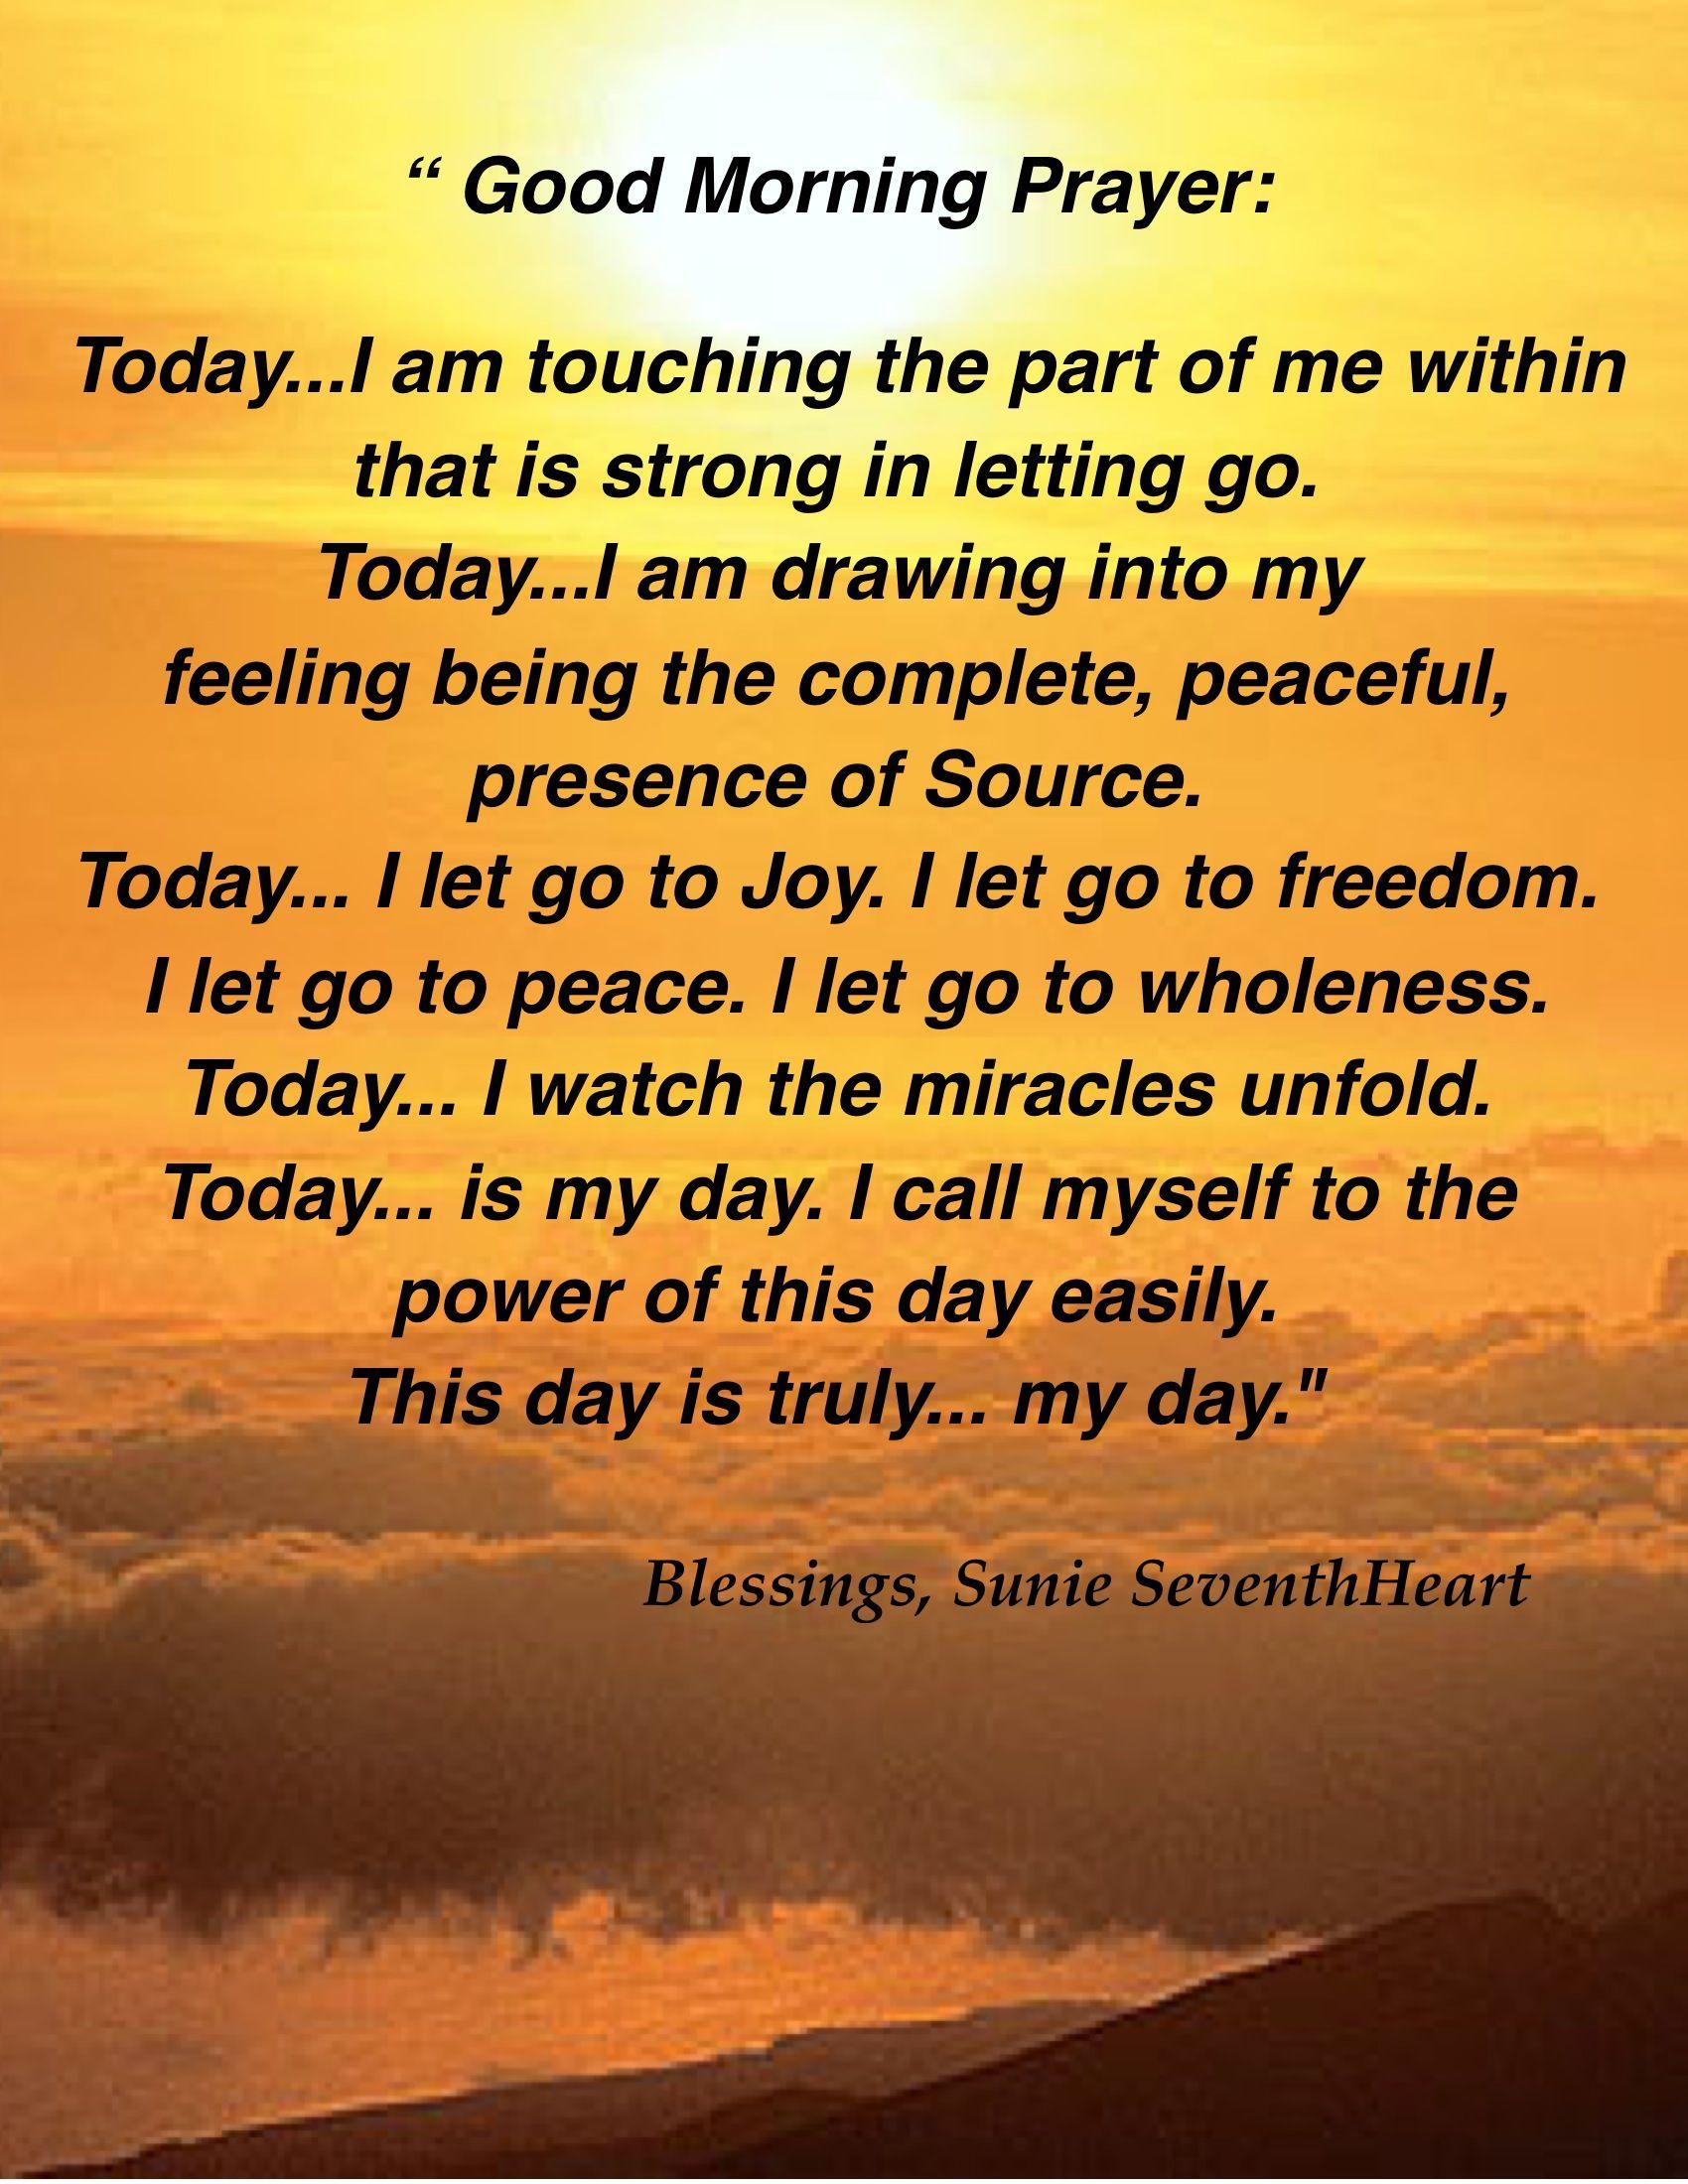 Good Morning Quotes Prayer : Morning prayer quotes quotesgram